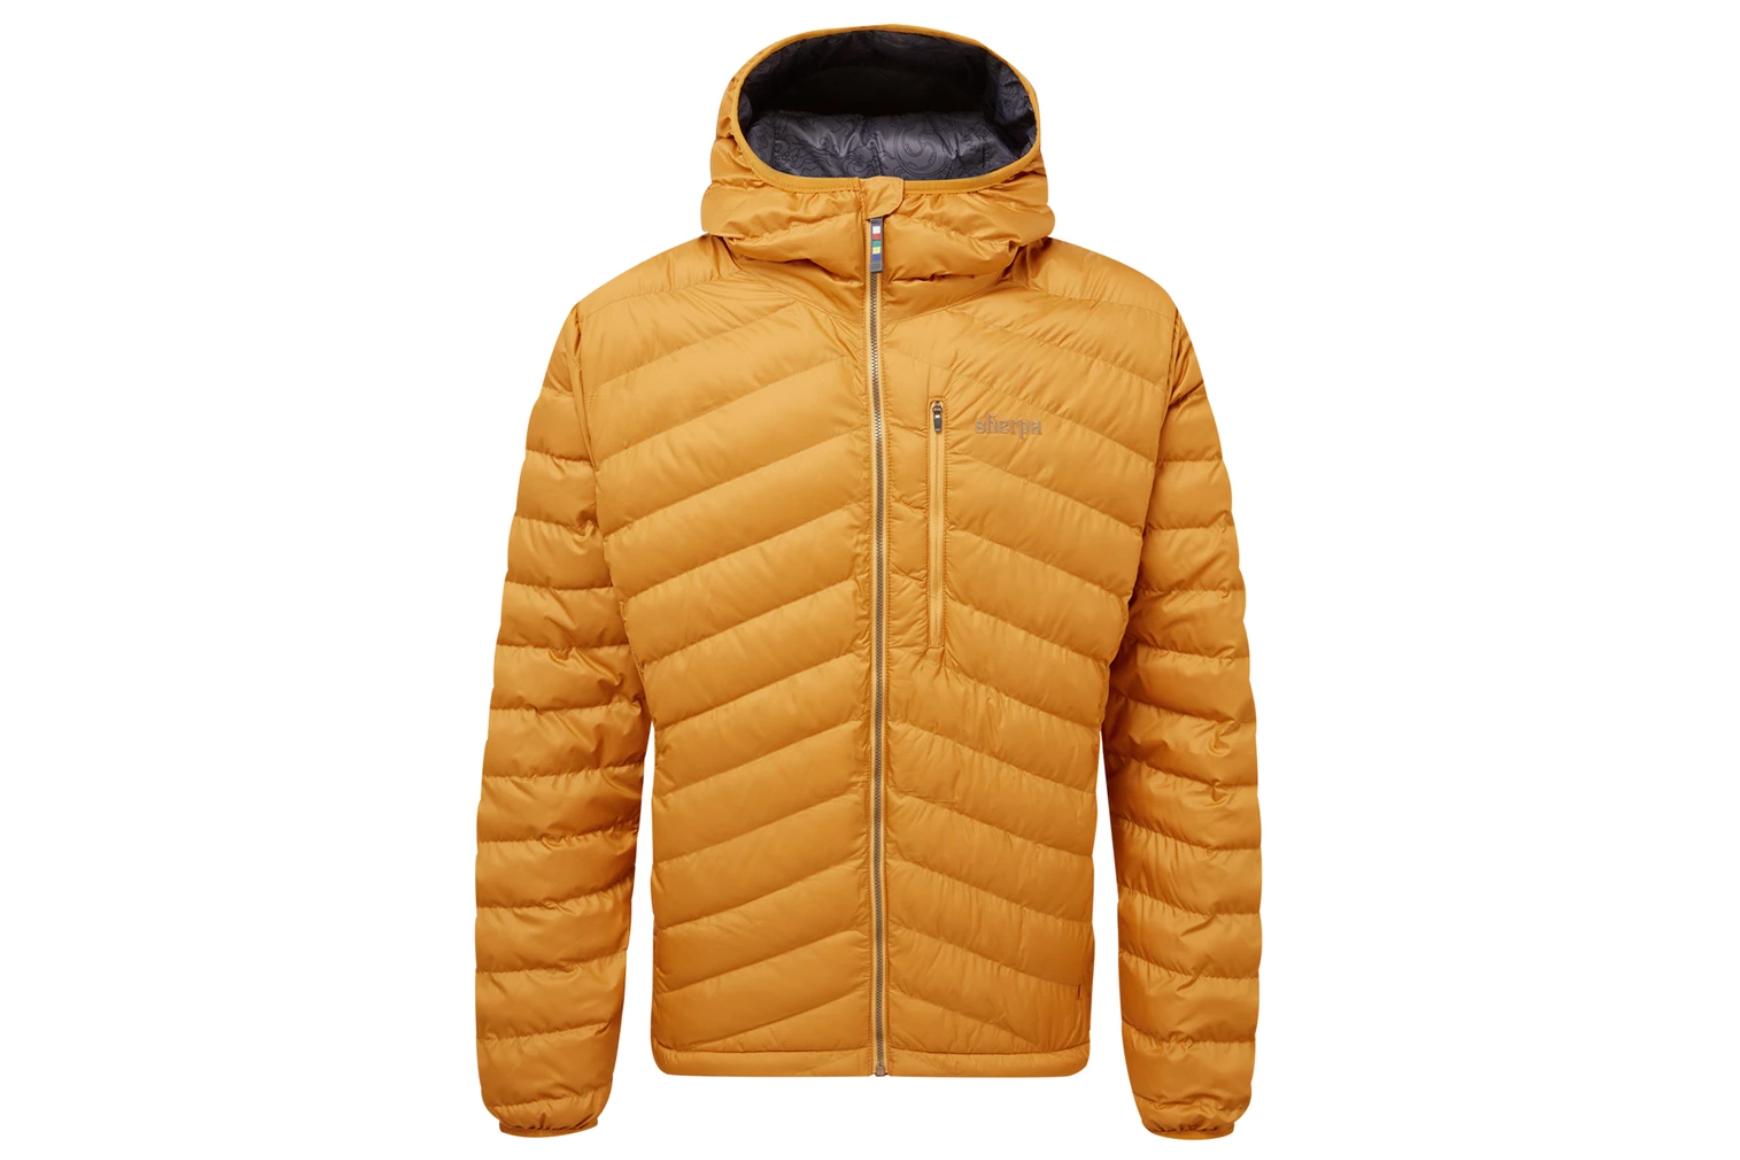 Sherpa Annapurna Featherless Down Hooded Jacket